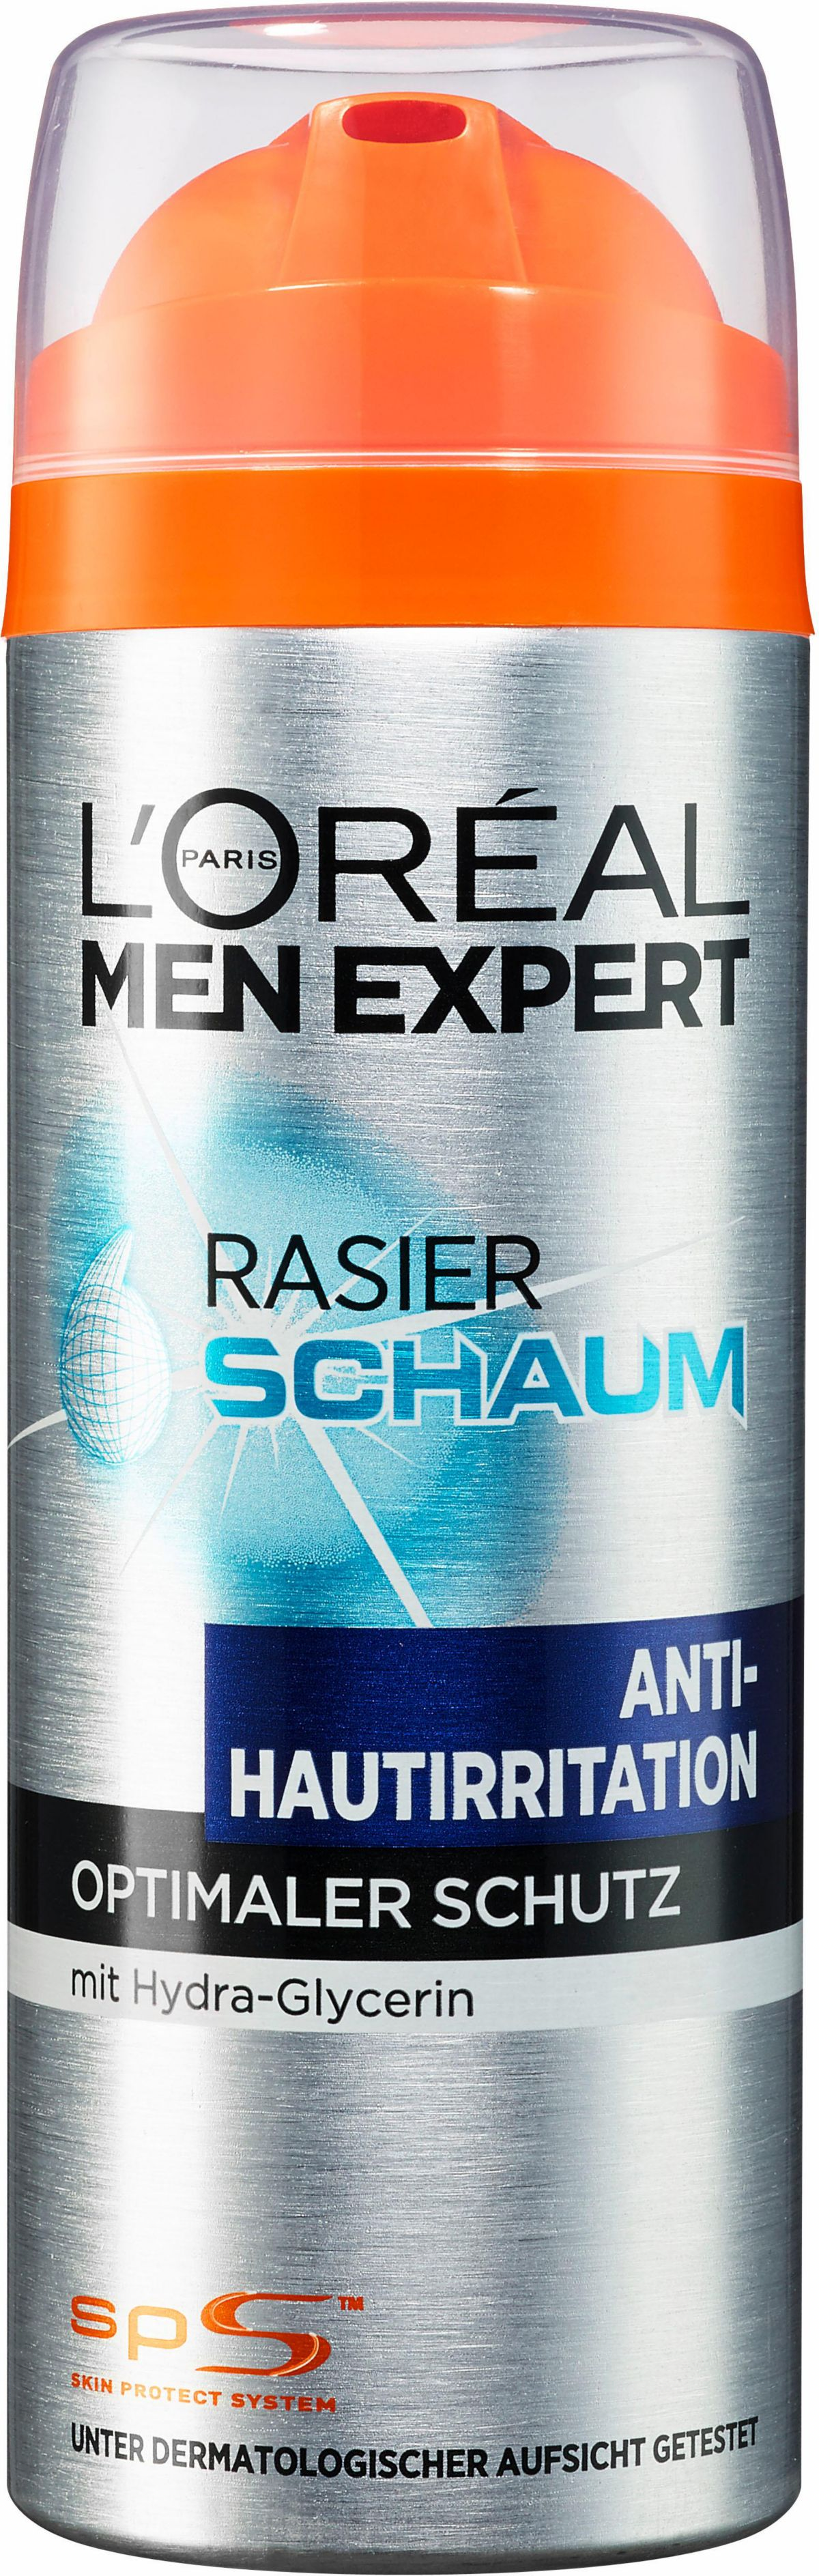 L´Oréal Paris Men Expert, »Hydra Energy Rasierschaum Anti-Hautirritation«, Rasiergel/-schaum